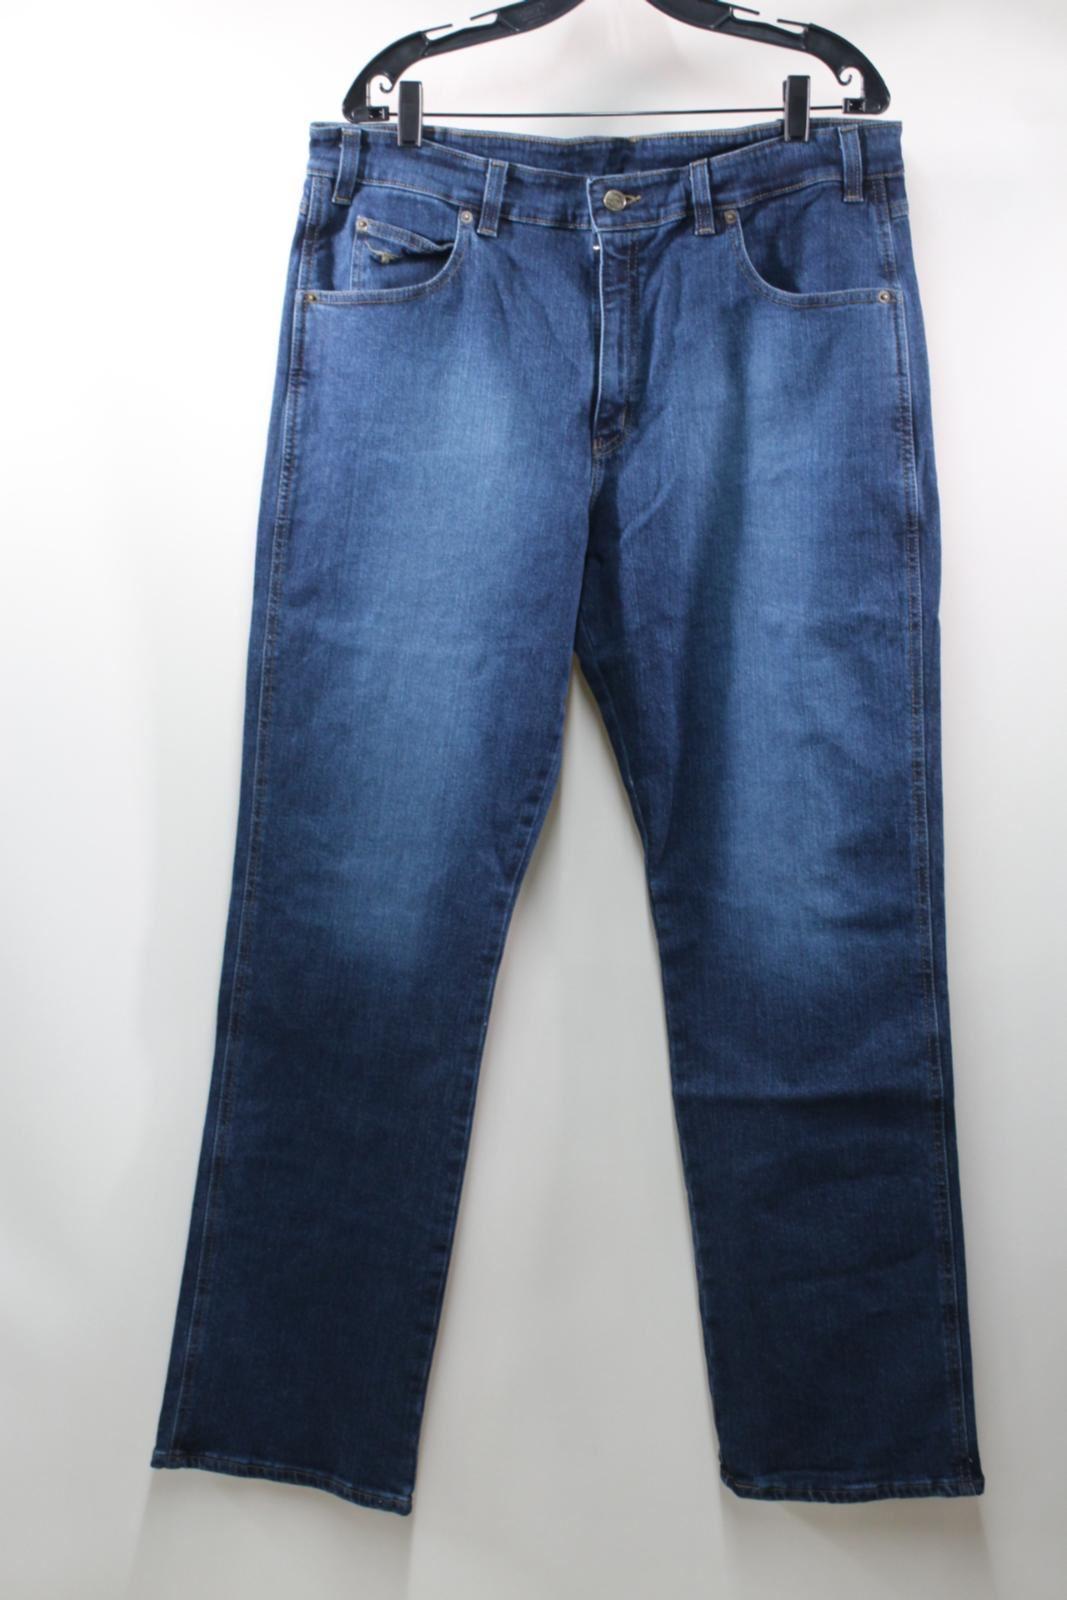 BNWT R.M. WILLIAMS Men's Blau Denim Straight Leg Low Rise Linesman Jeans 40R W38